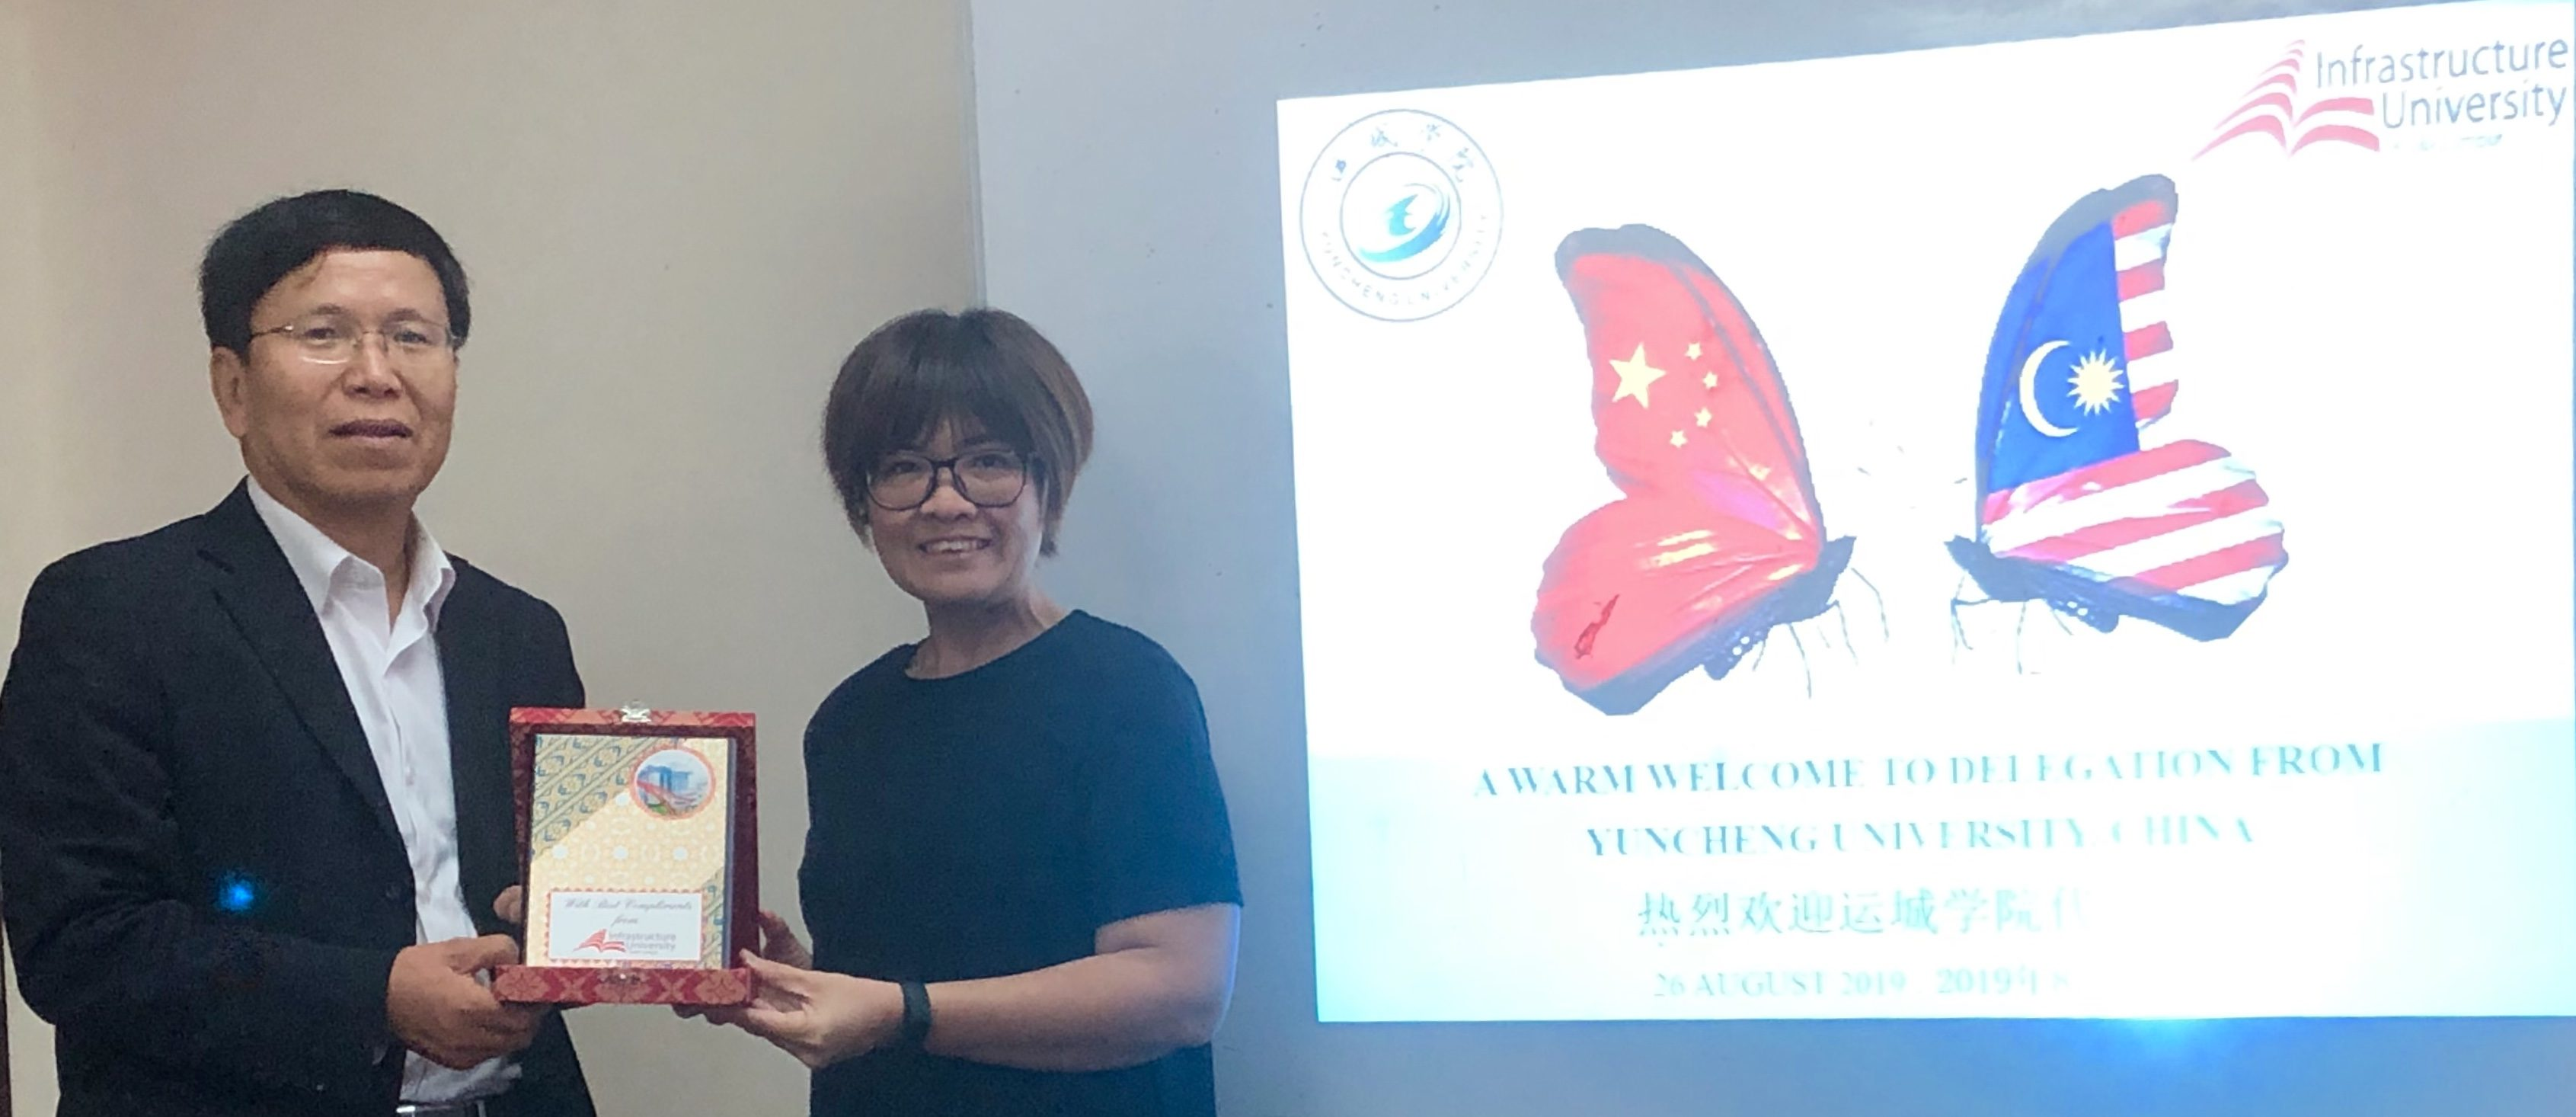 Visit from Yuncheng University (YCU), China